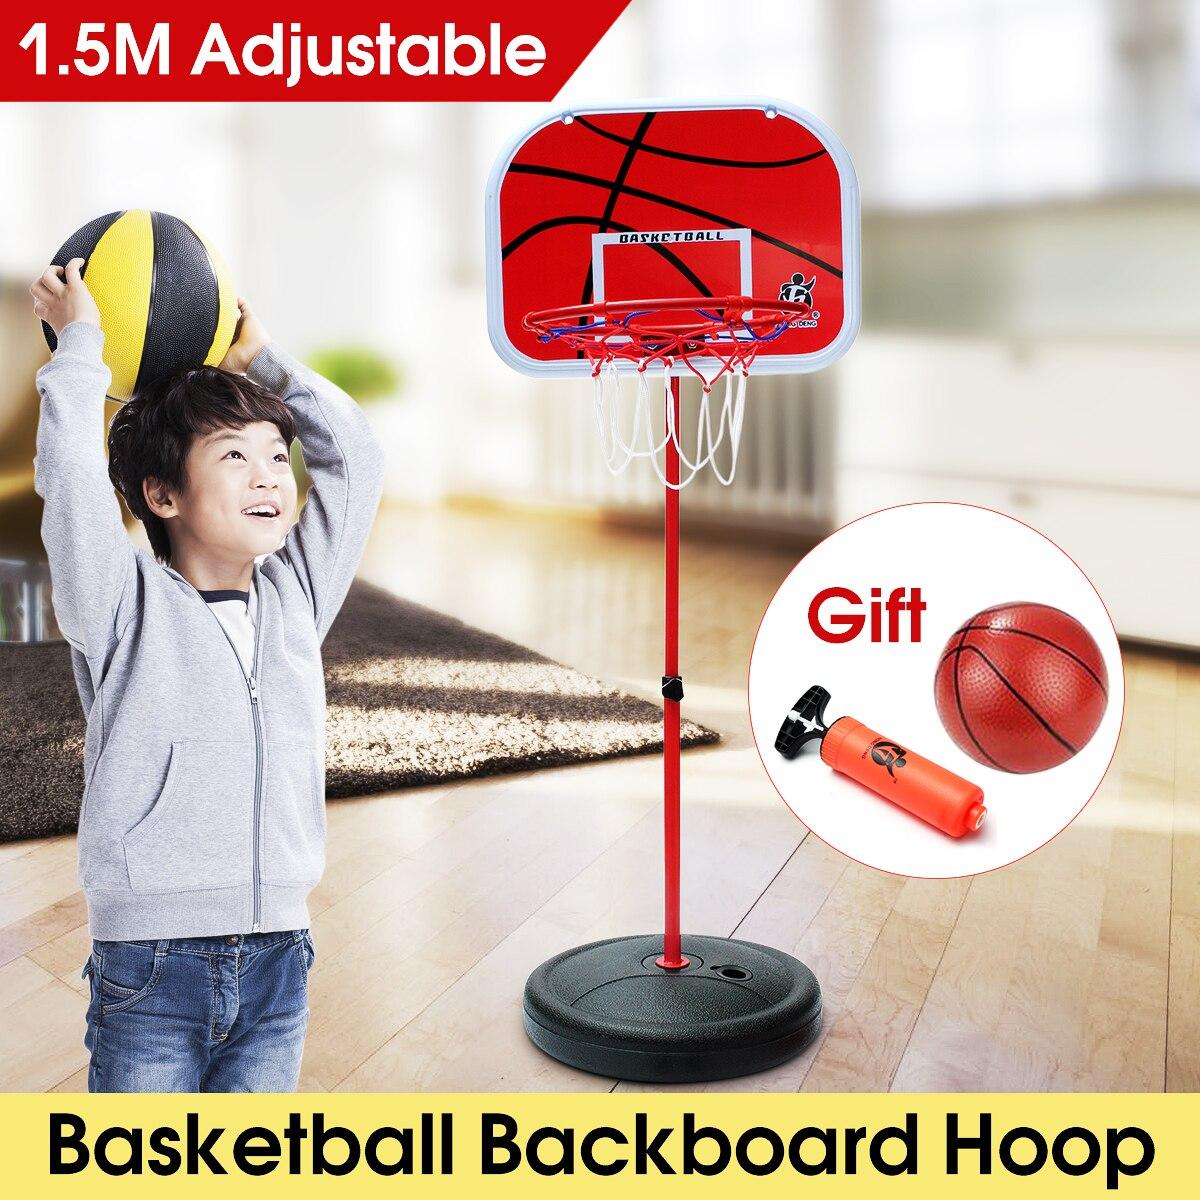 1.5m Height Adjustable Kids Mimi Basketball Hoop Rim Net Set Backboard Basket Ball 72-150cm Red Basketball Hoop+Basketball+Pump